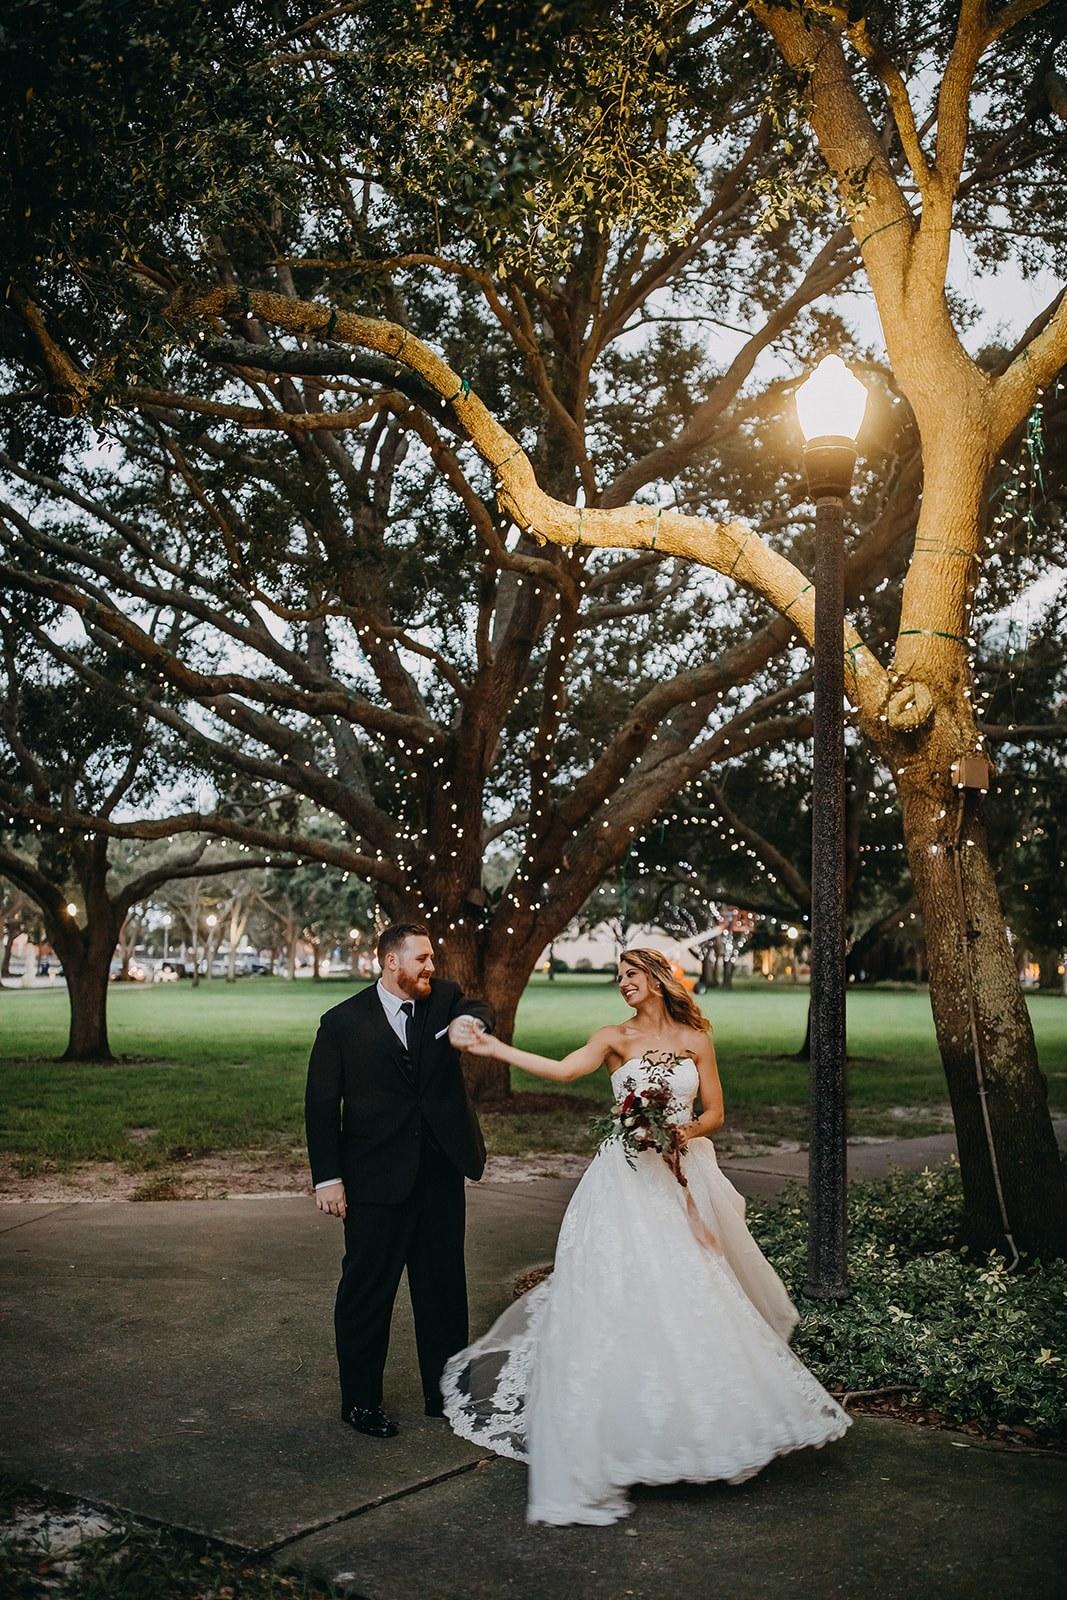 Romantic Downtown St. Pete Bride and Groom Wedding Portrait at Straub Park | Downtown St. Pete Historic Wedding Venue NOVA 535